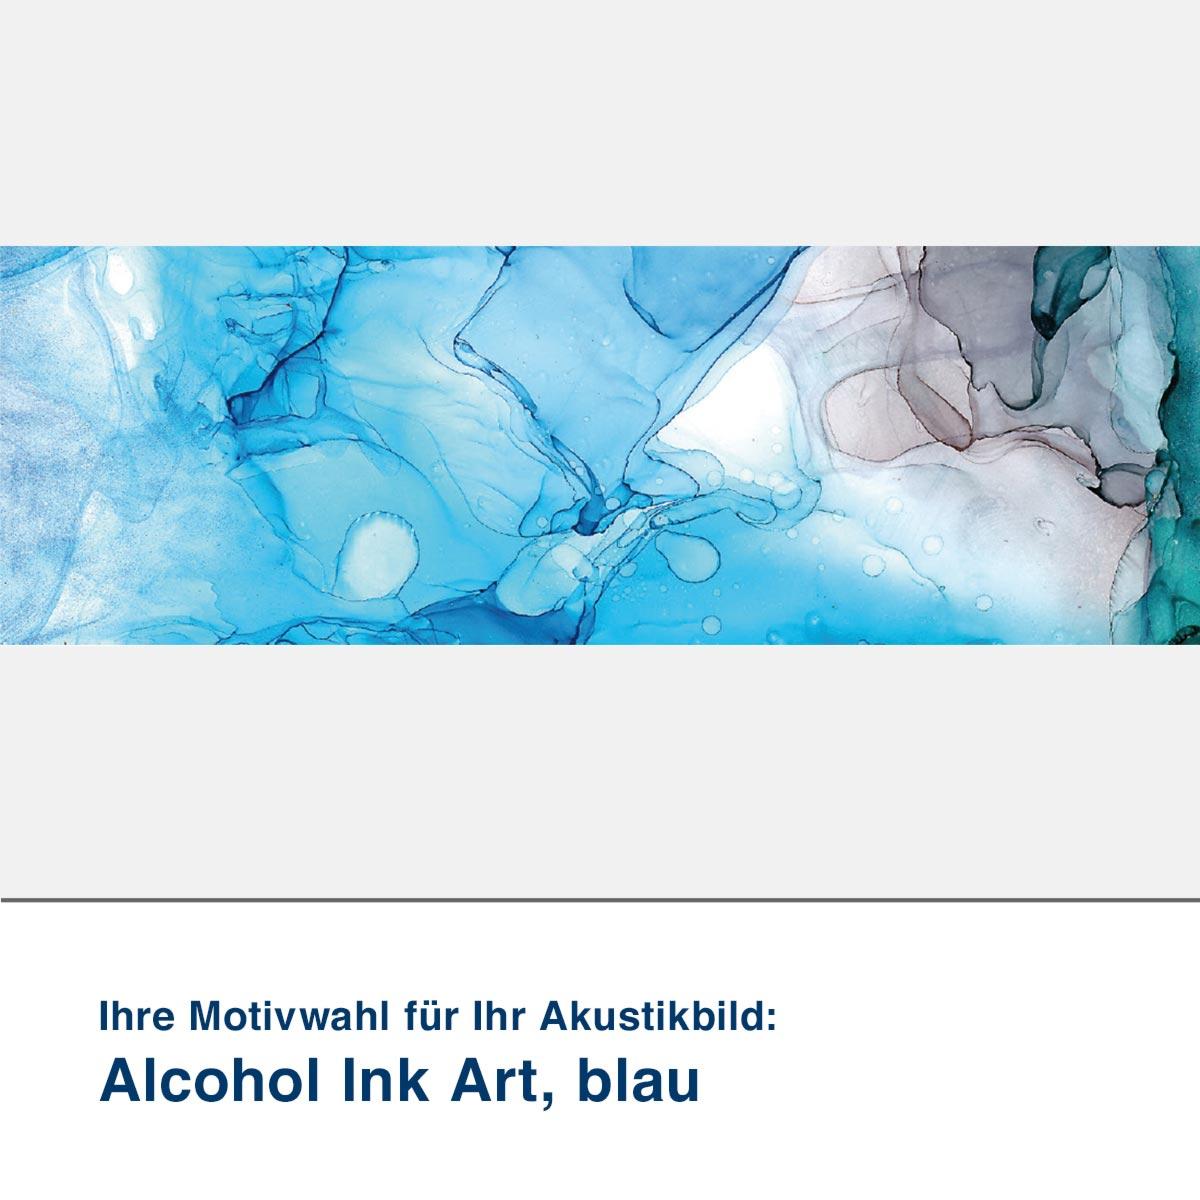 Akustikbild Motiv Alcohol Ink Art, blau